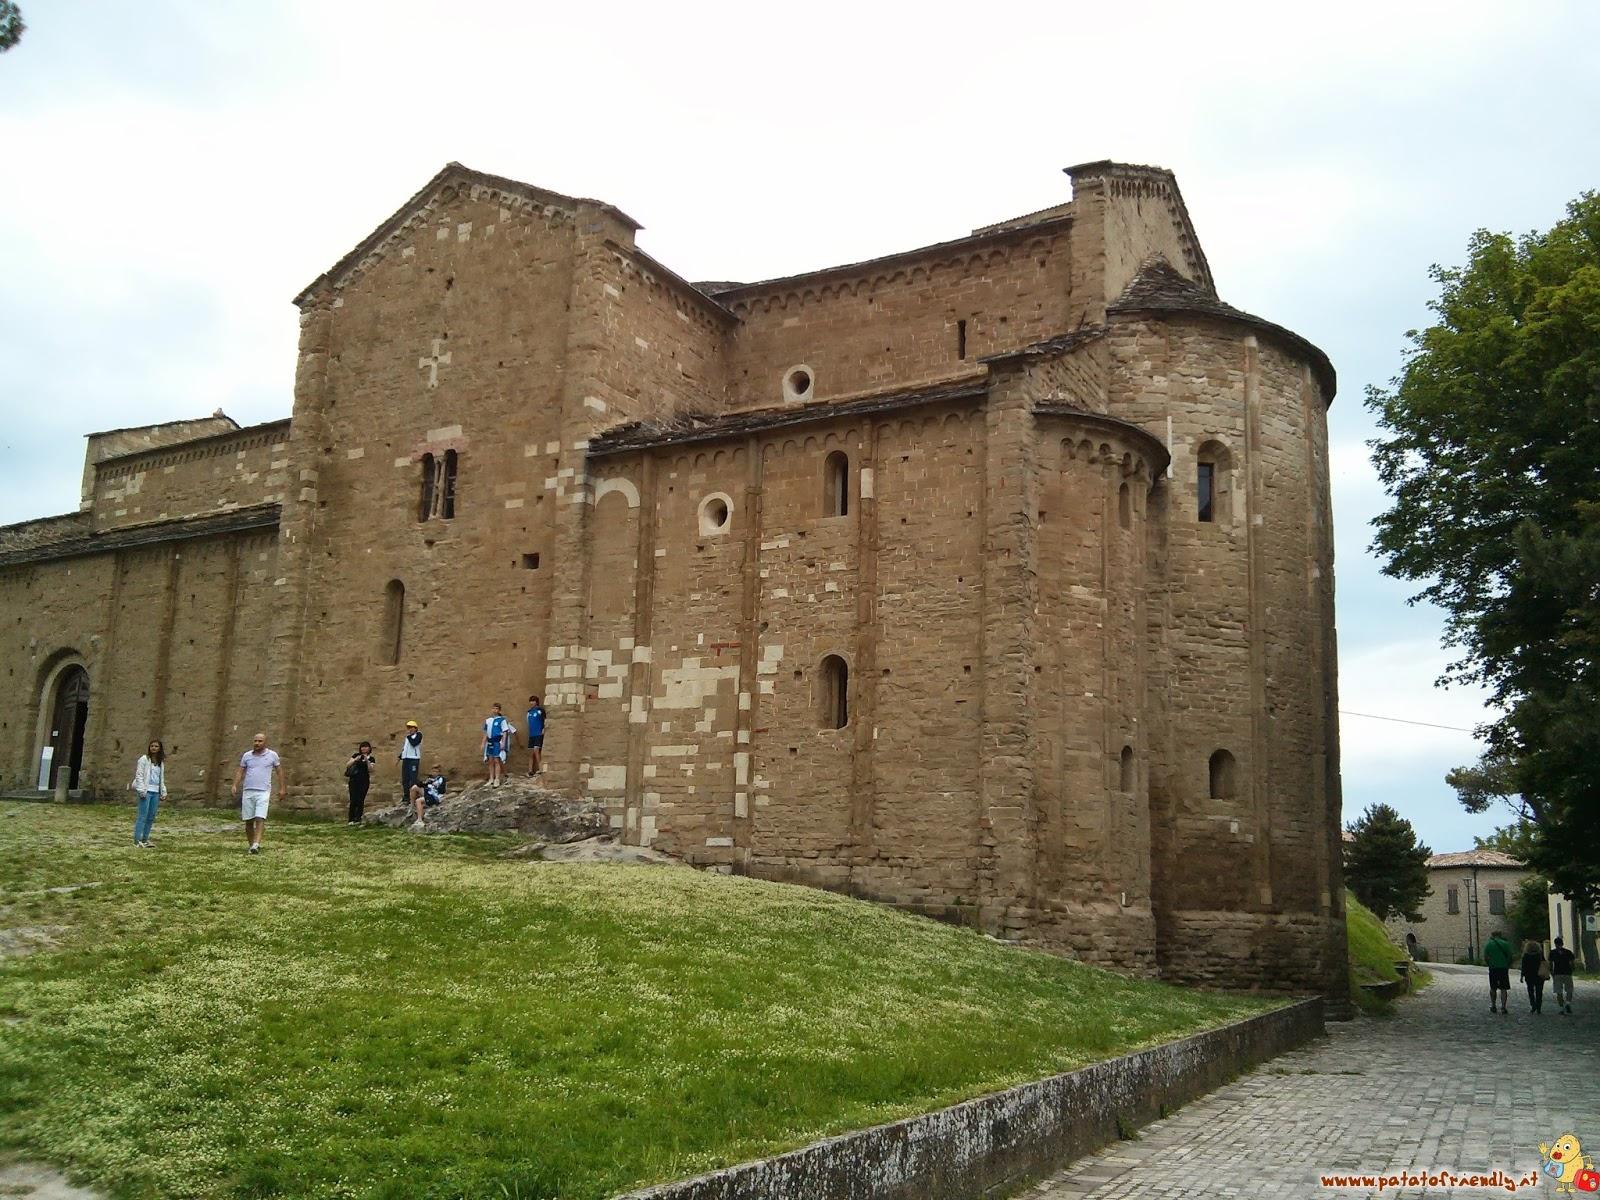 Cosa vedere a San Leo - La Pieve di Santa Maria Assunta a San Leo